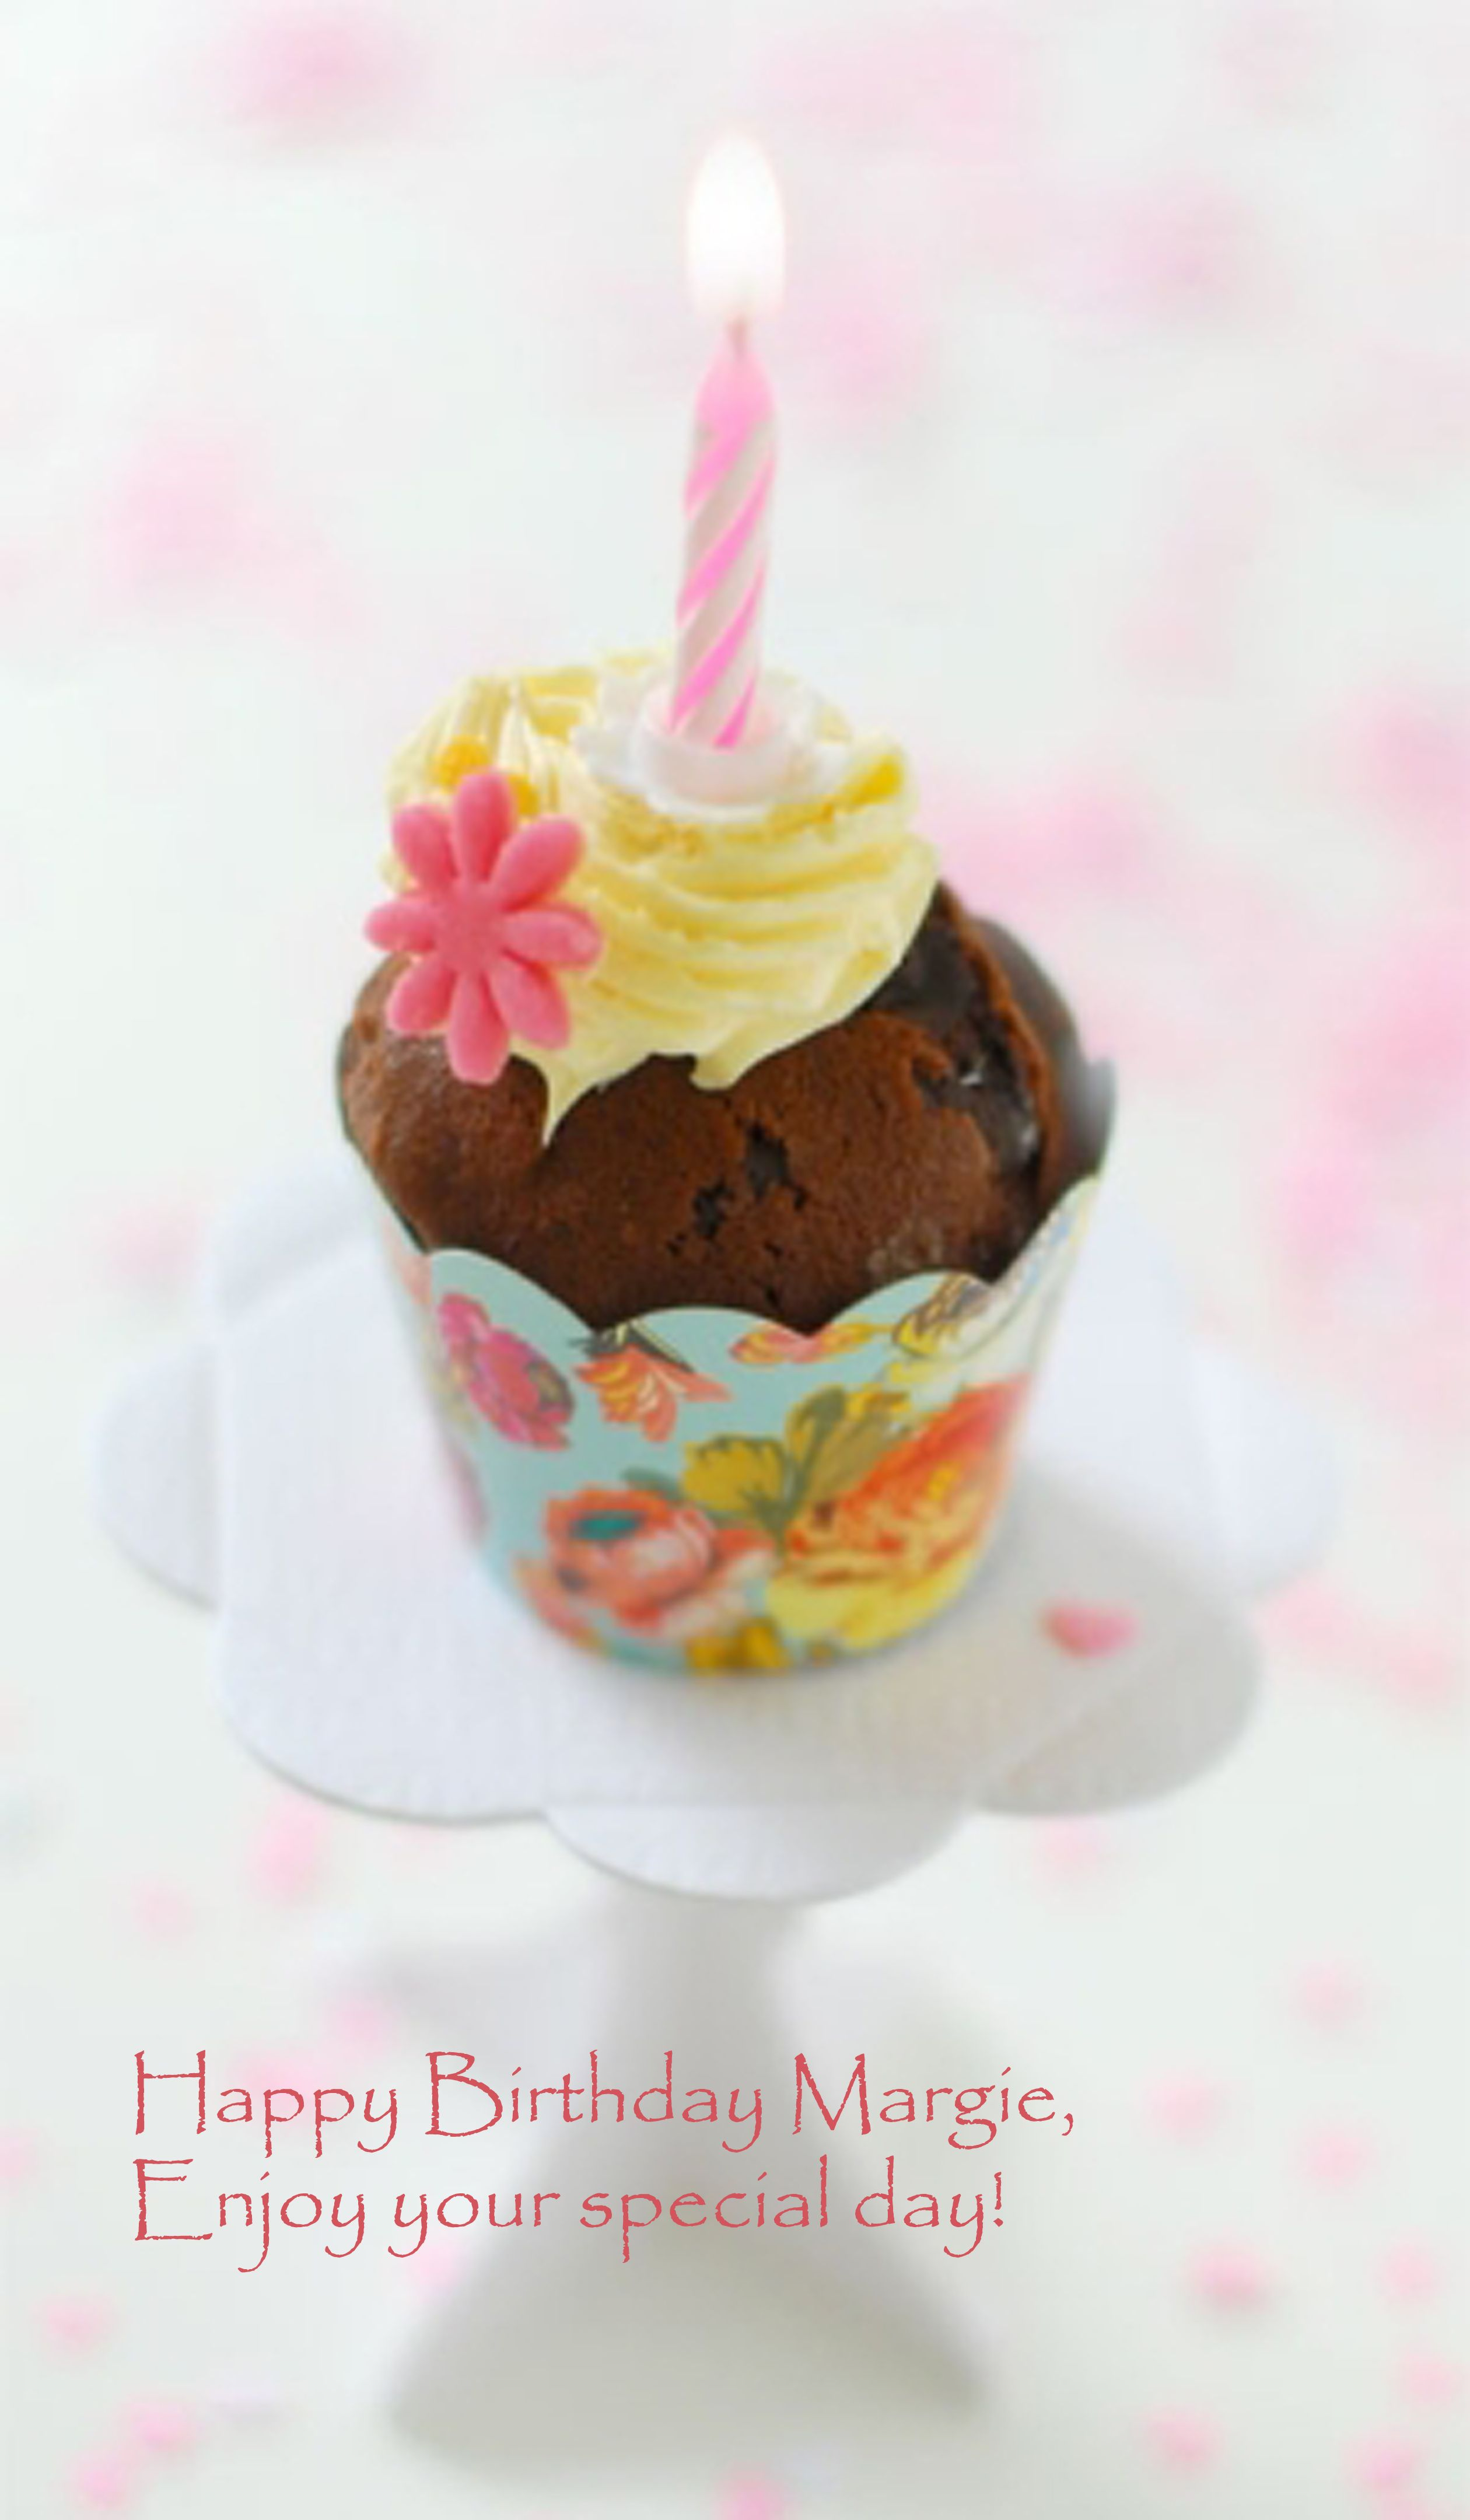 Happy Birthday Margie Tartas Cupcakes Feliz Cumpleanos